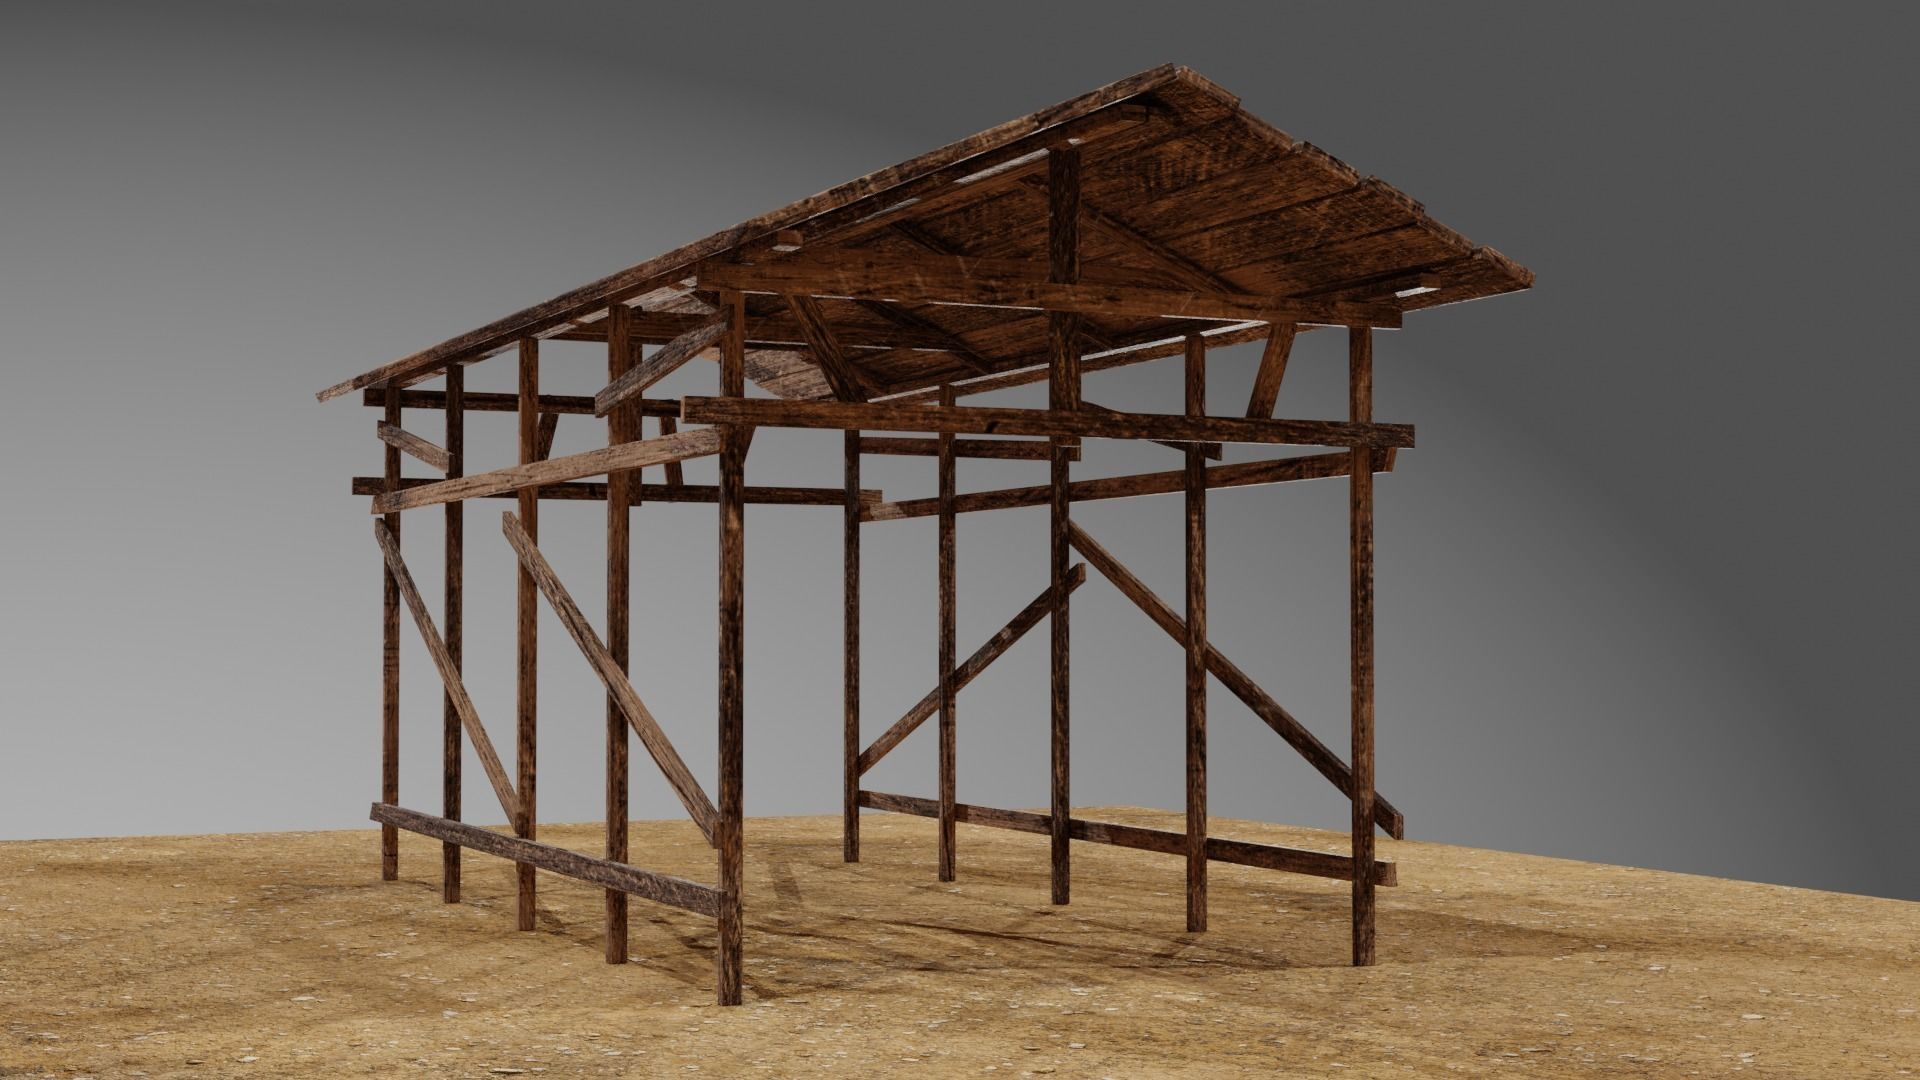 Wooden Shed or Shelter